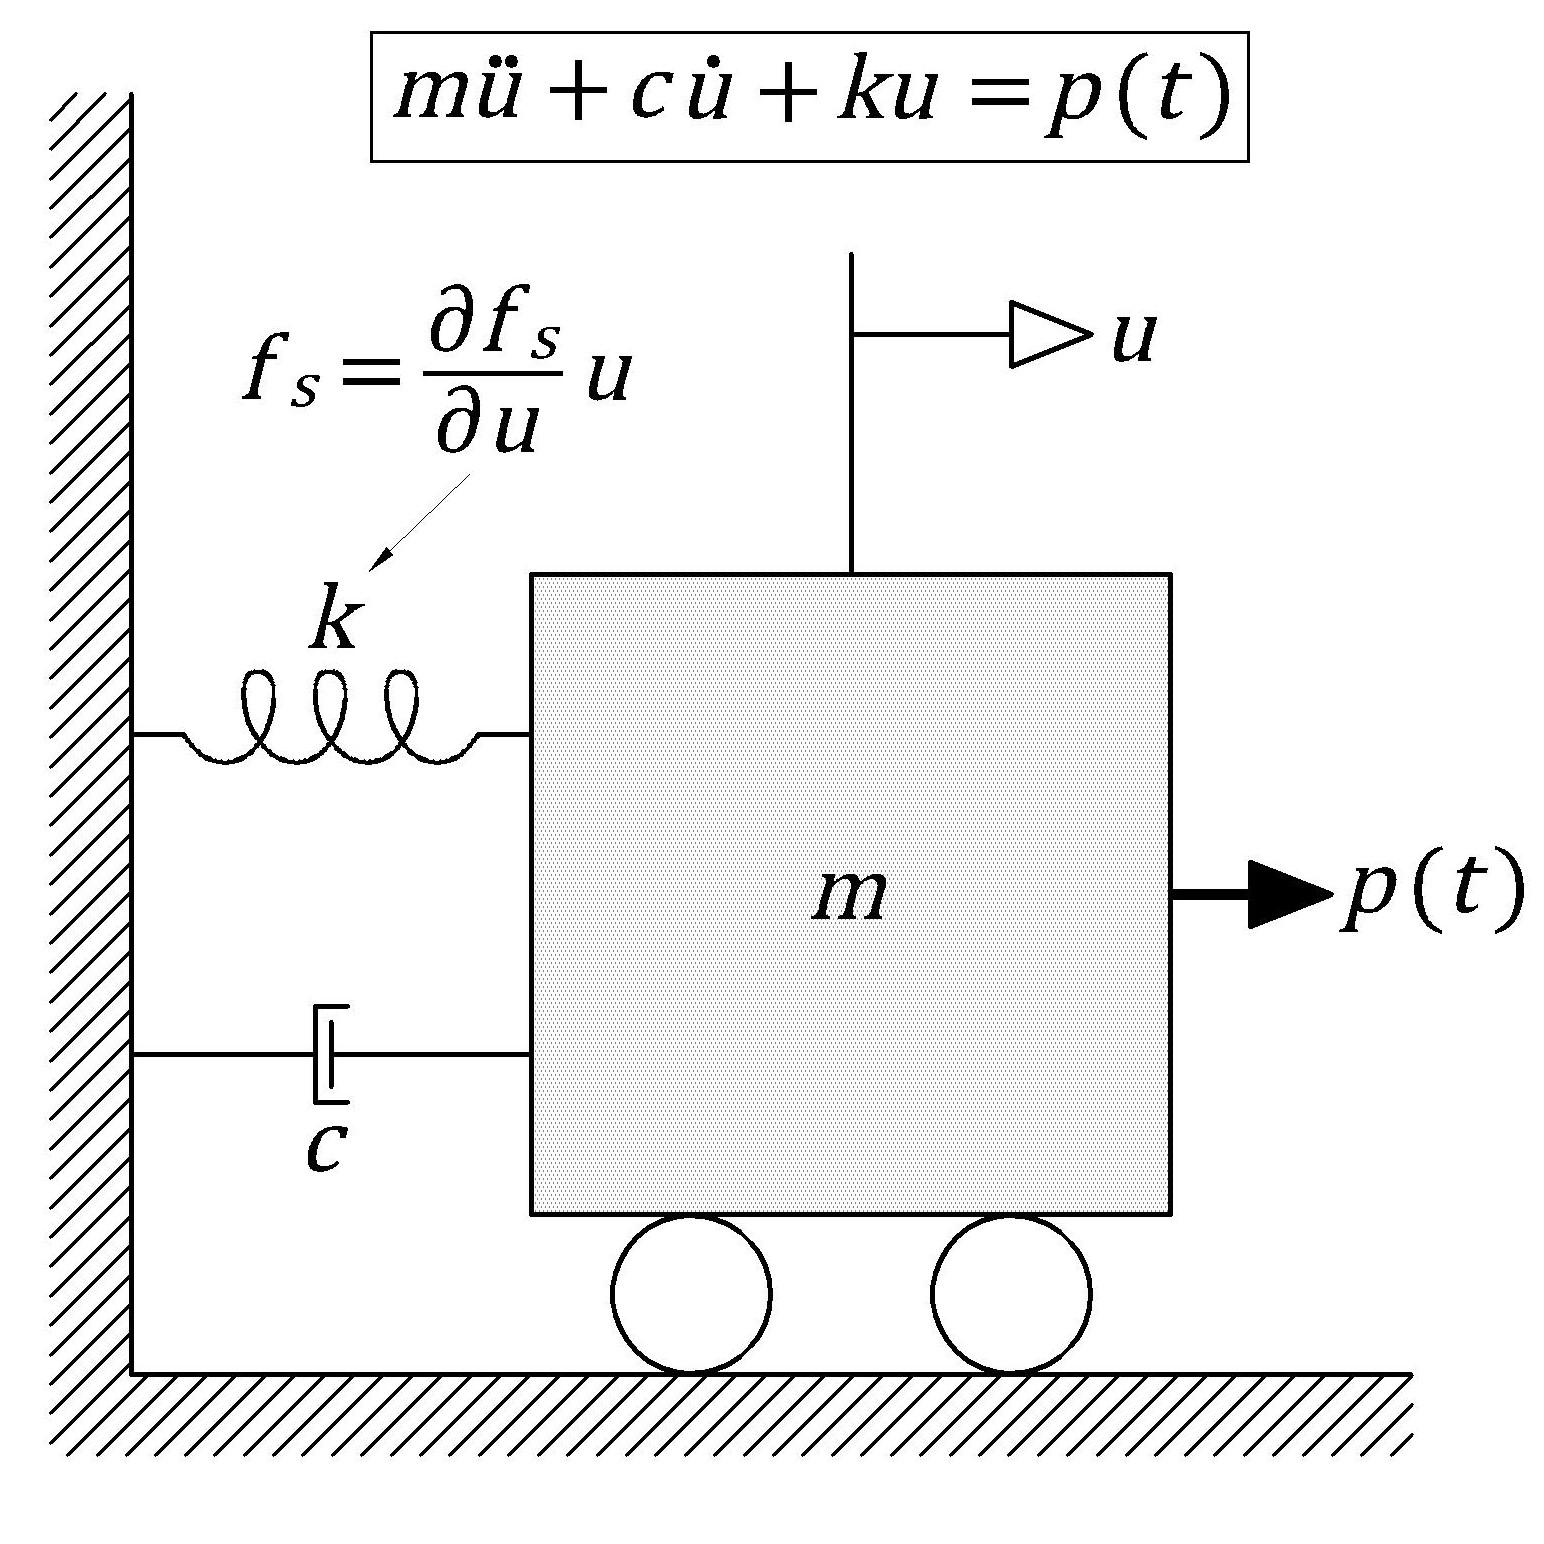 Newmark-beta Method for Nonlinear Single DOF Systems